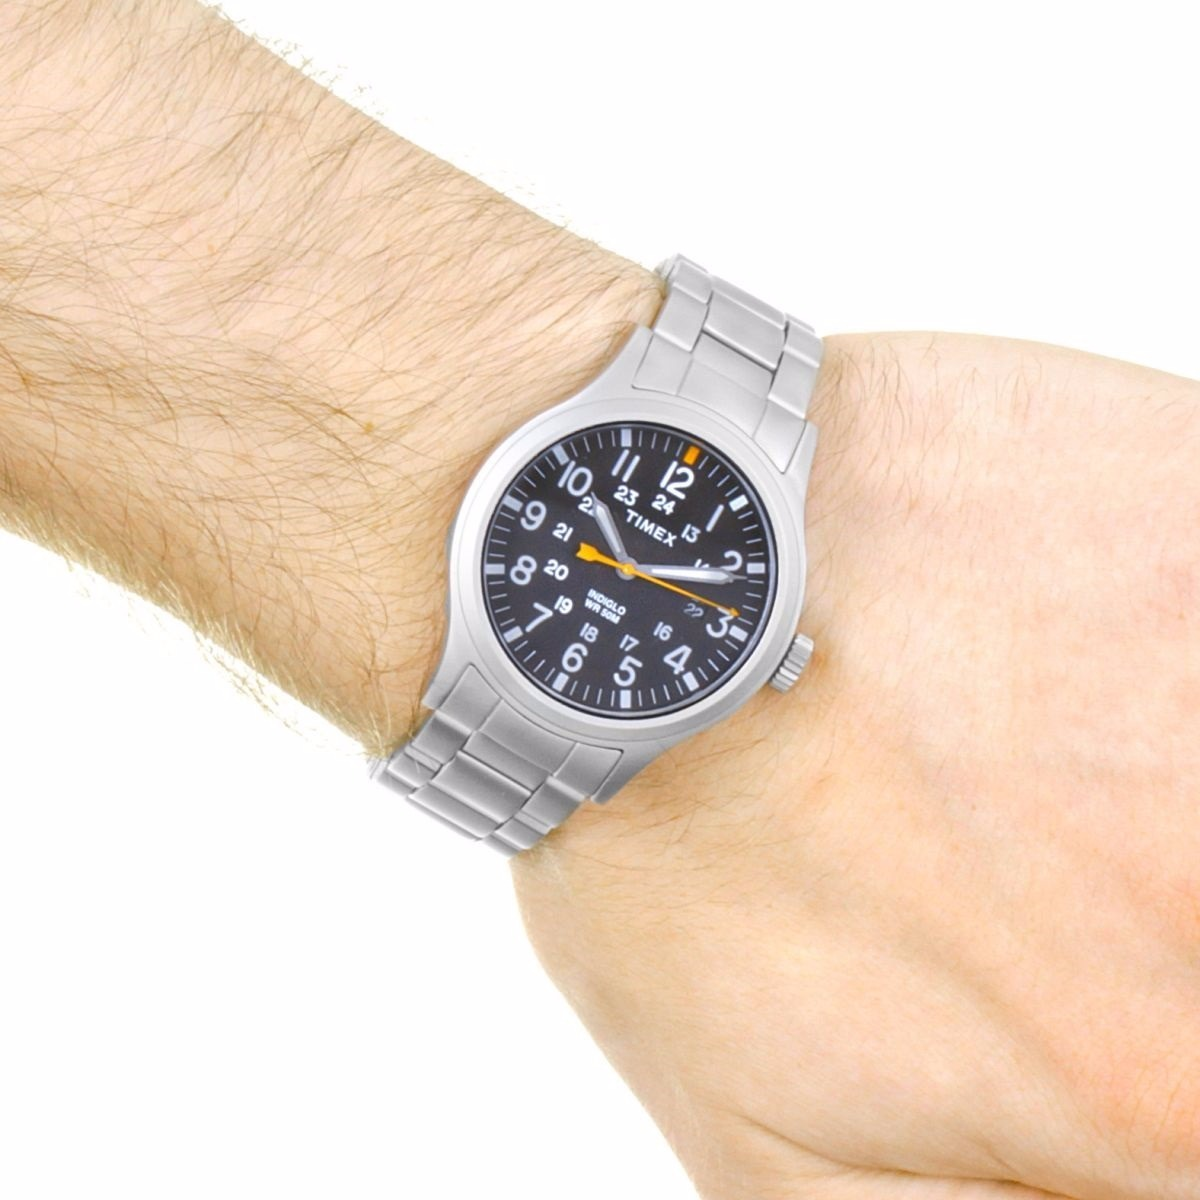 f8166d3d52a2 reloj timex allied tw2r46600 caballero plateado luz original. Cargando zoom.